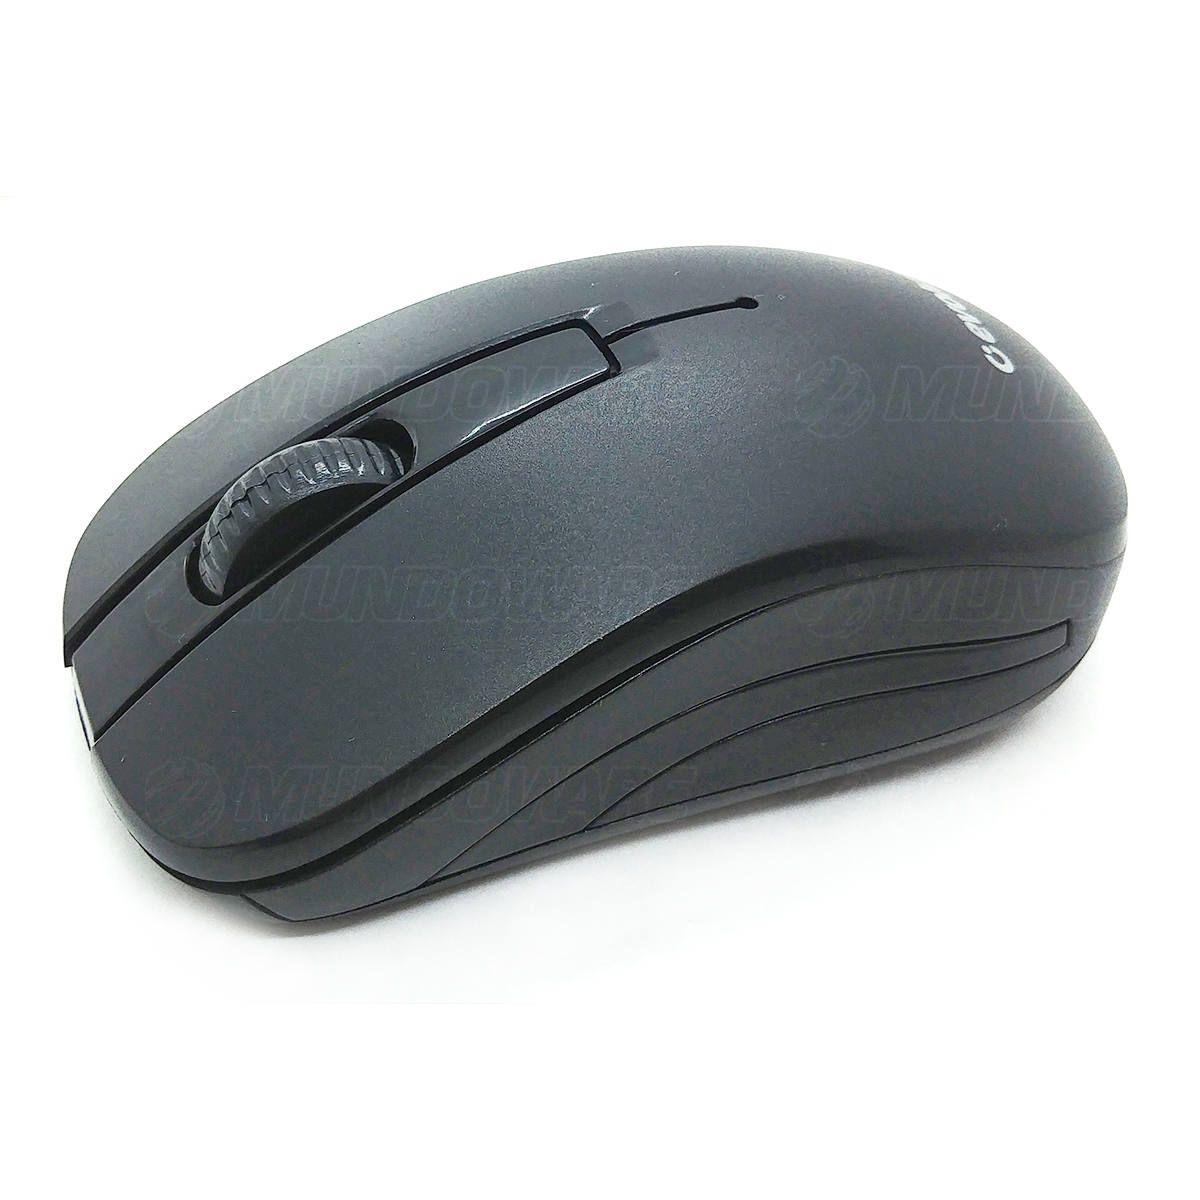 Combo Teclado e Mouse Wireless Padrão ABNT2 pt-br Evolut EO502 Preto